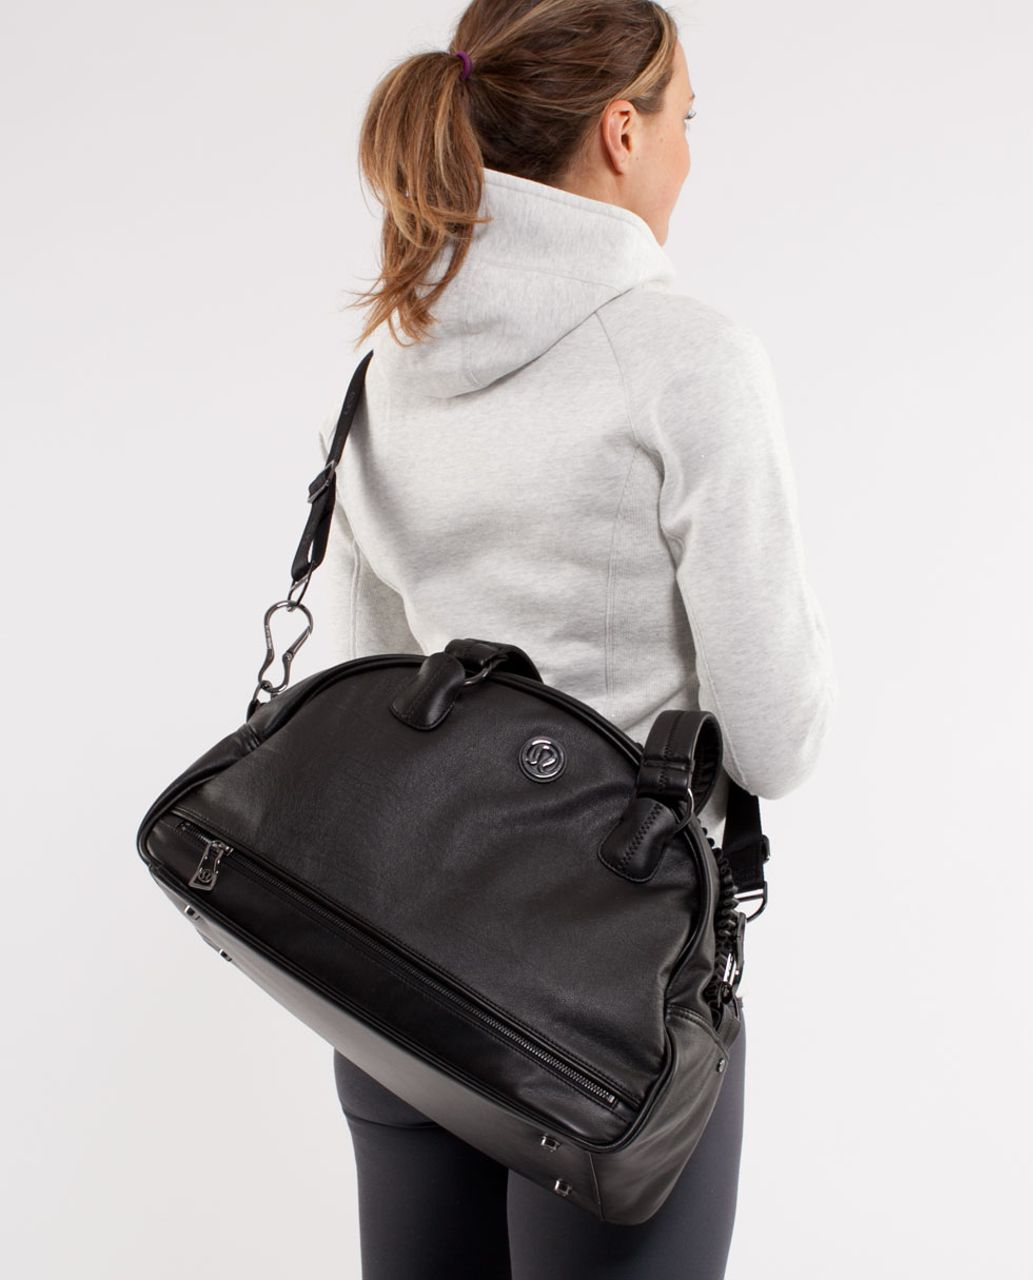 Lululemon Still Groovy Bag - Black